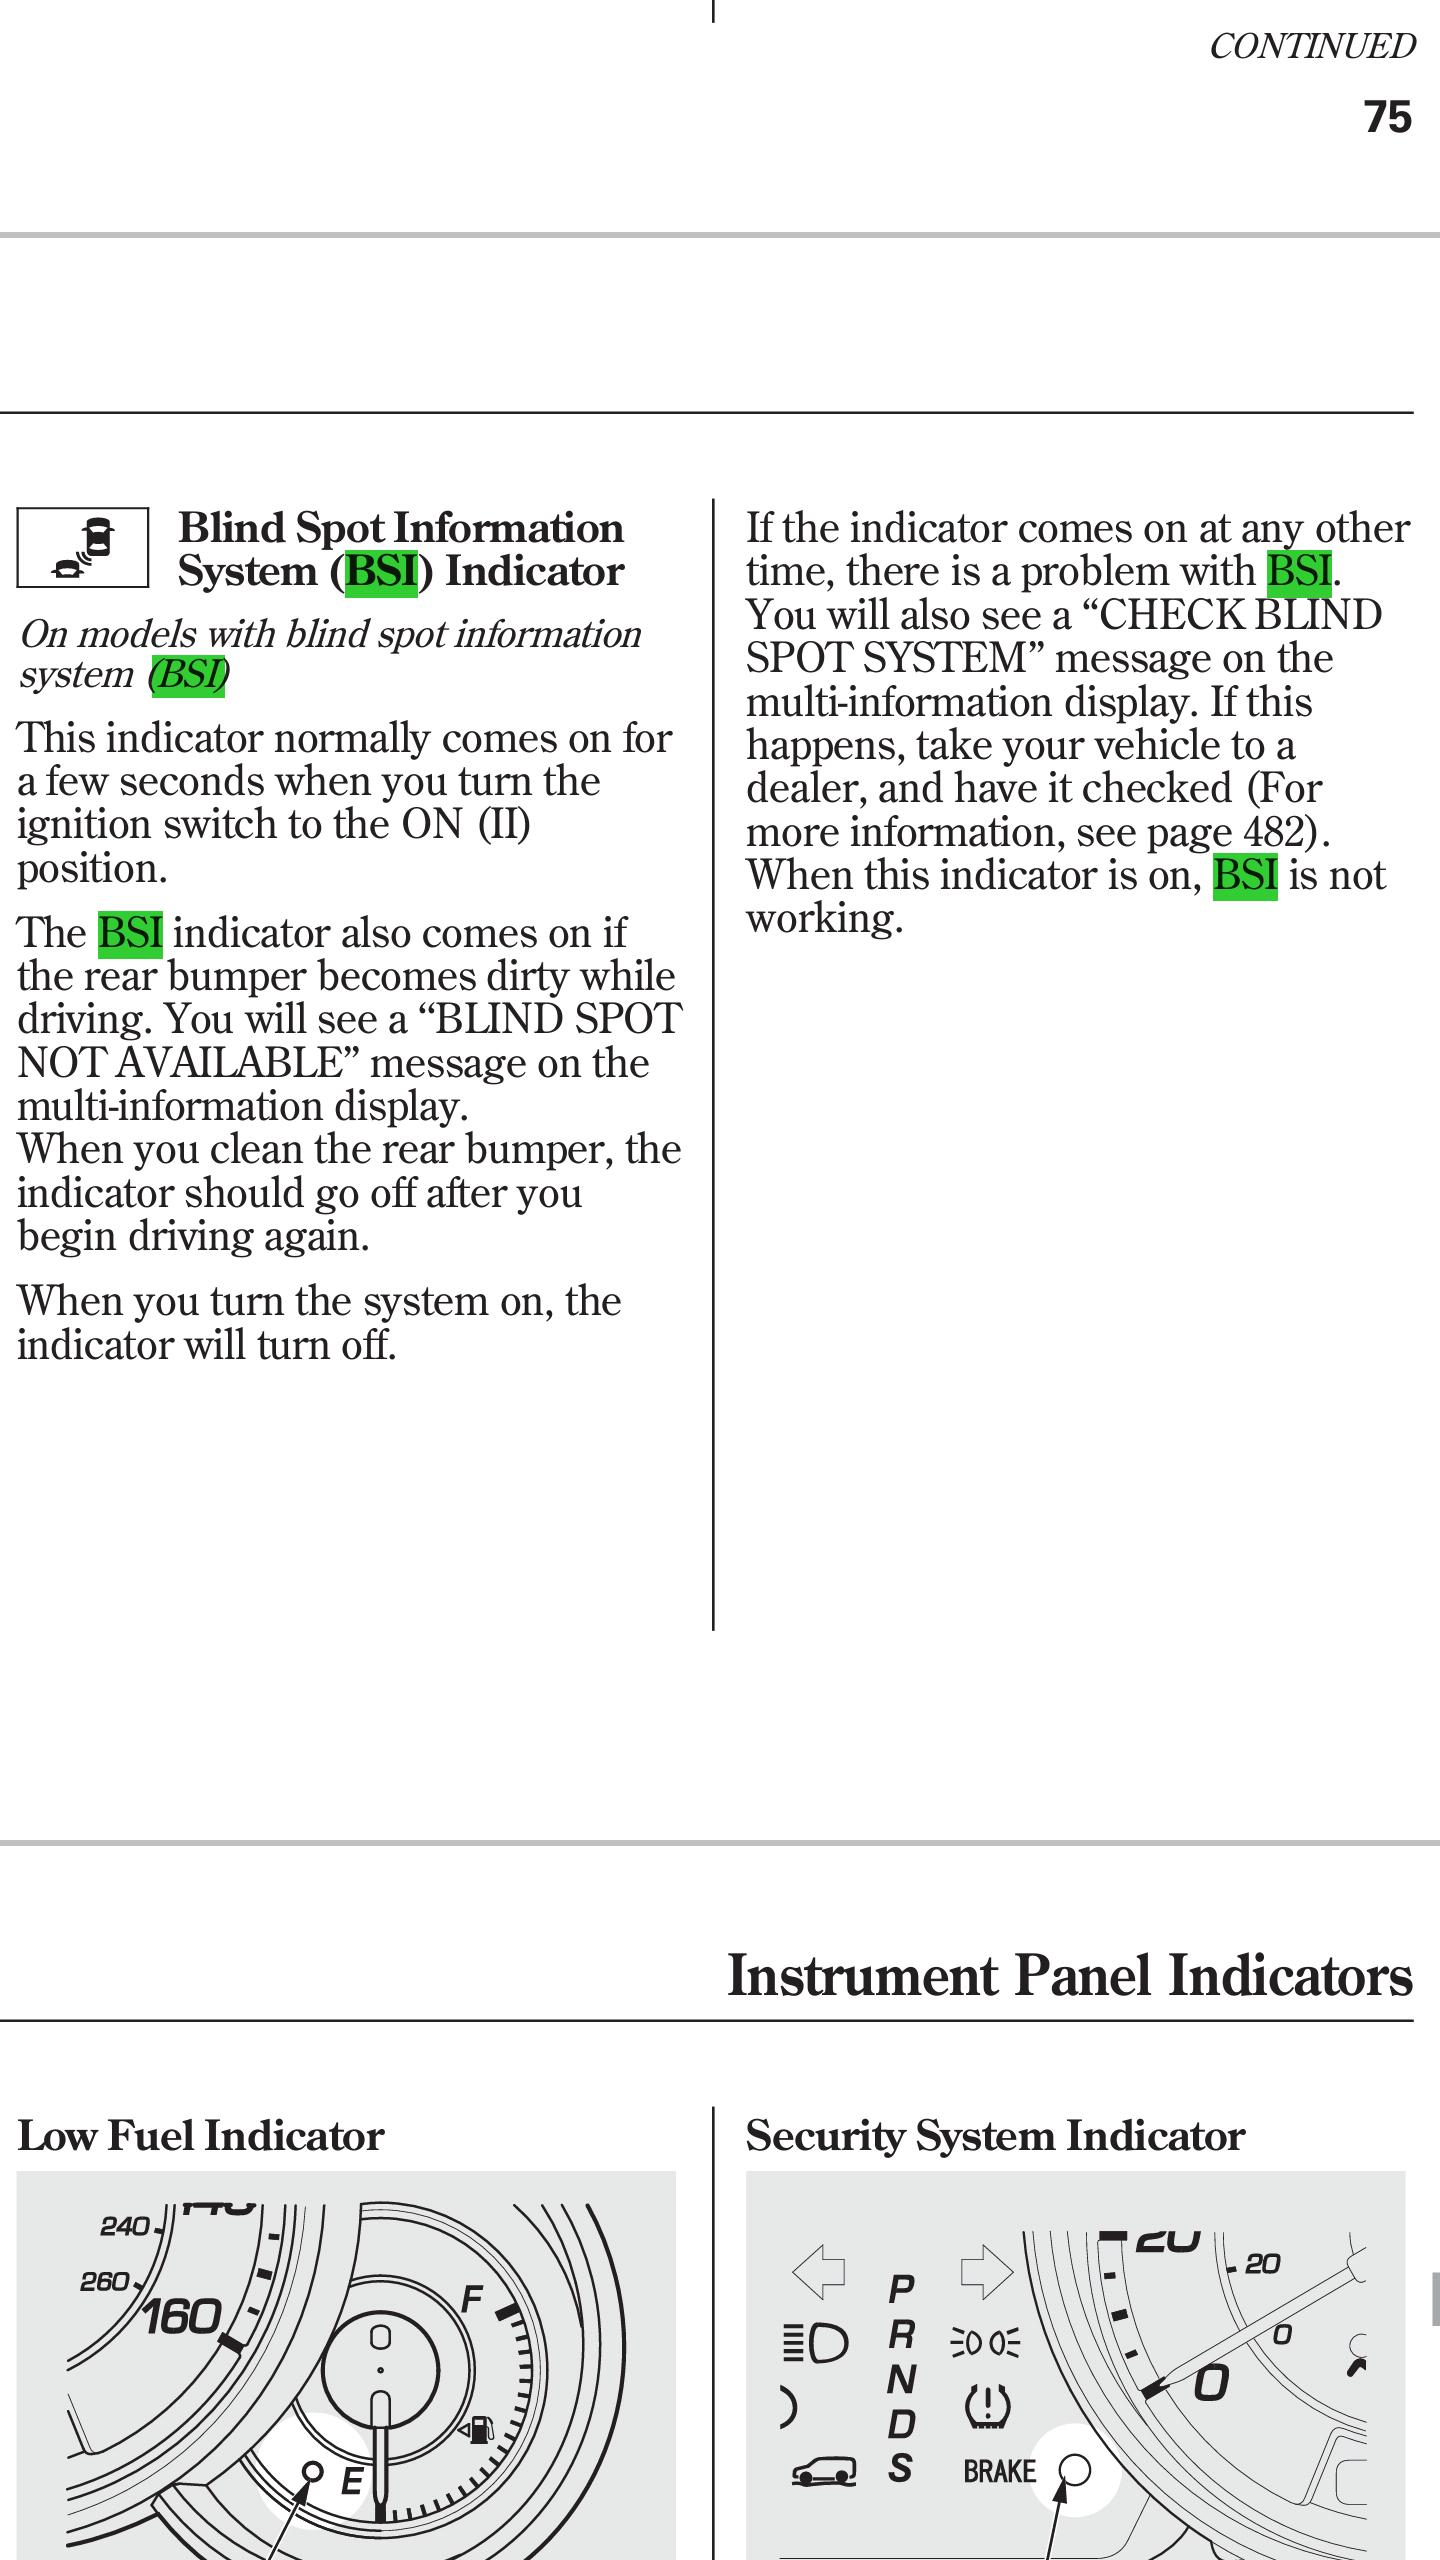 Stealth Golf Cart Wiring Diagram : Blind spot information wiring diagram acura mdx